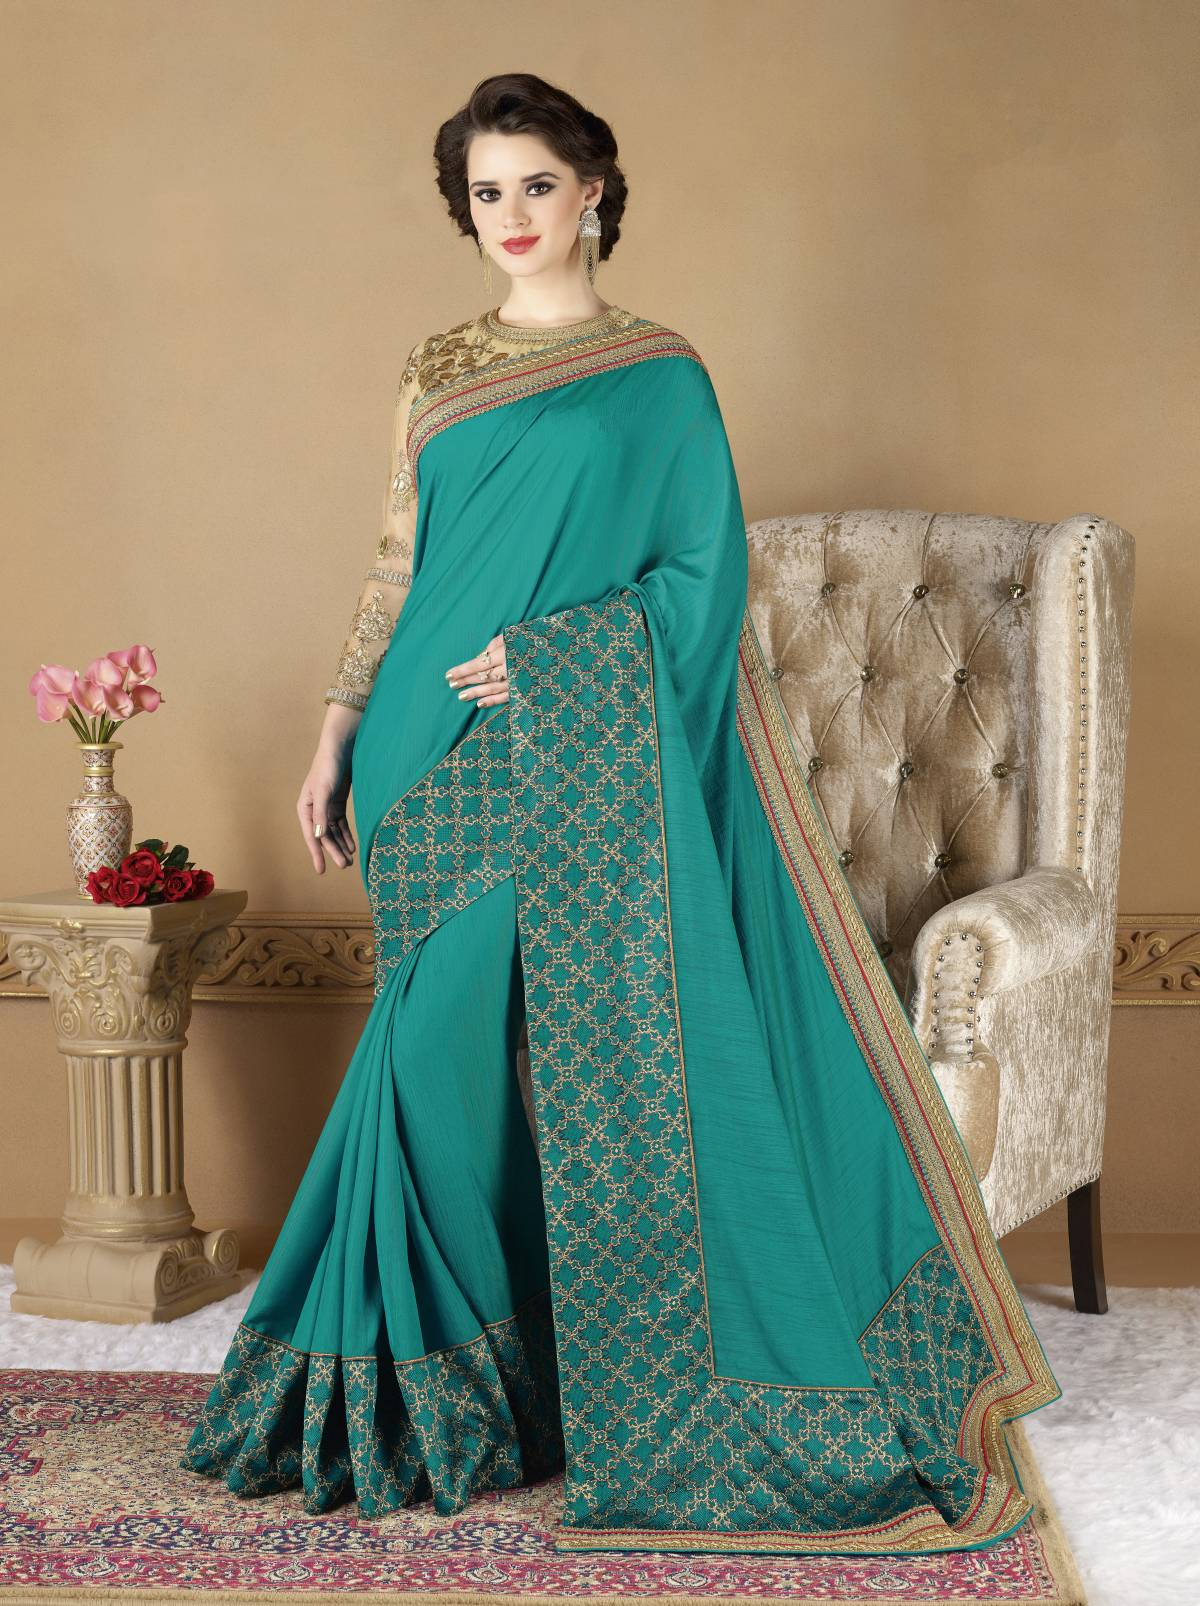 Embroidered Art Silk Saree (Sari) in Turquoise